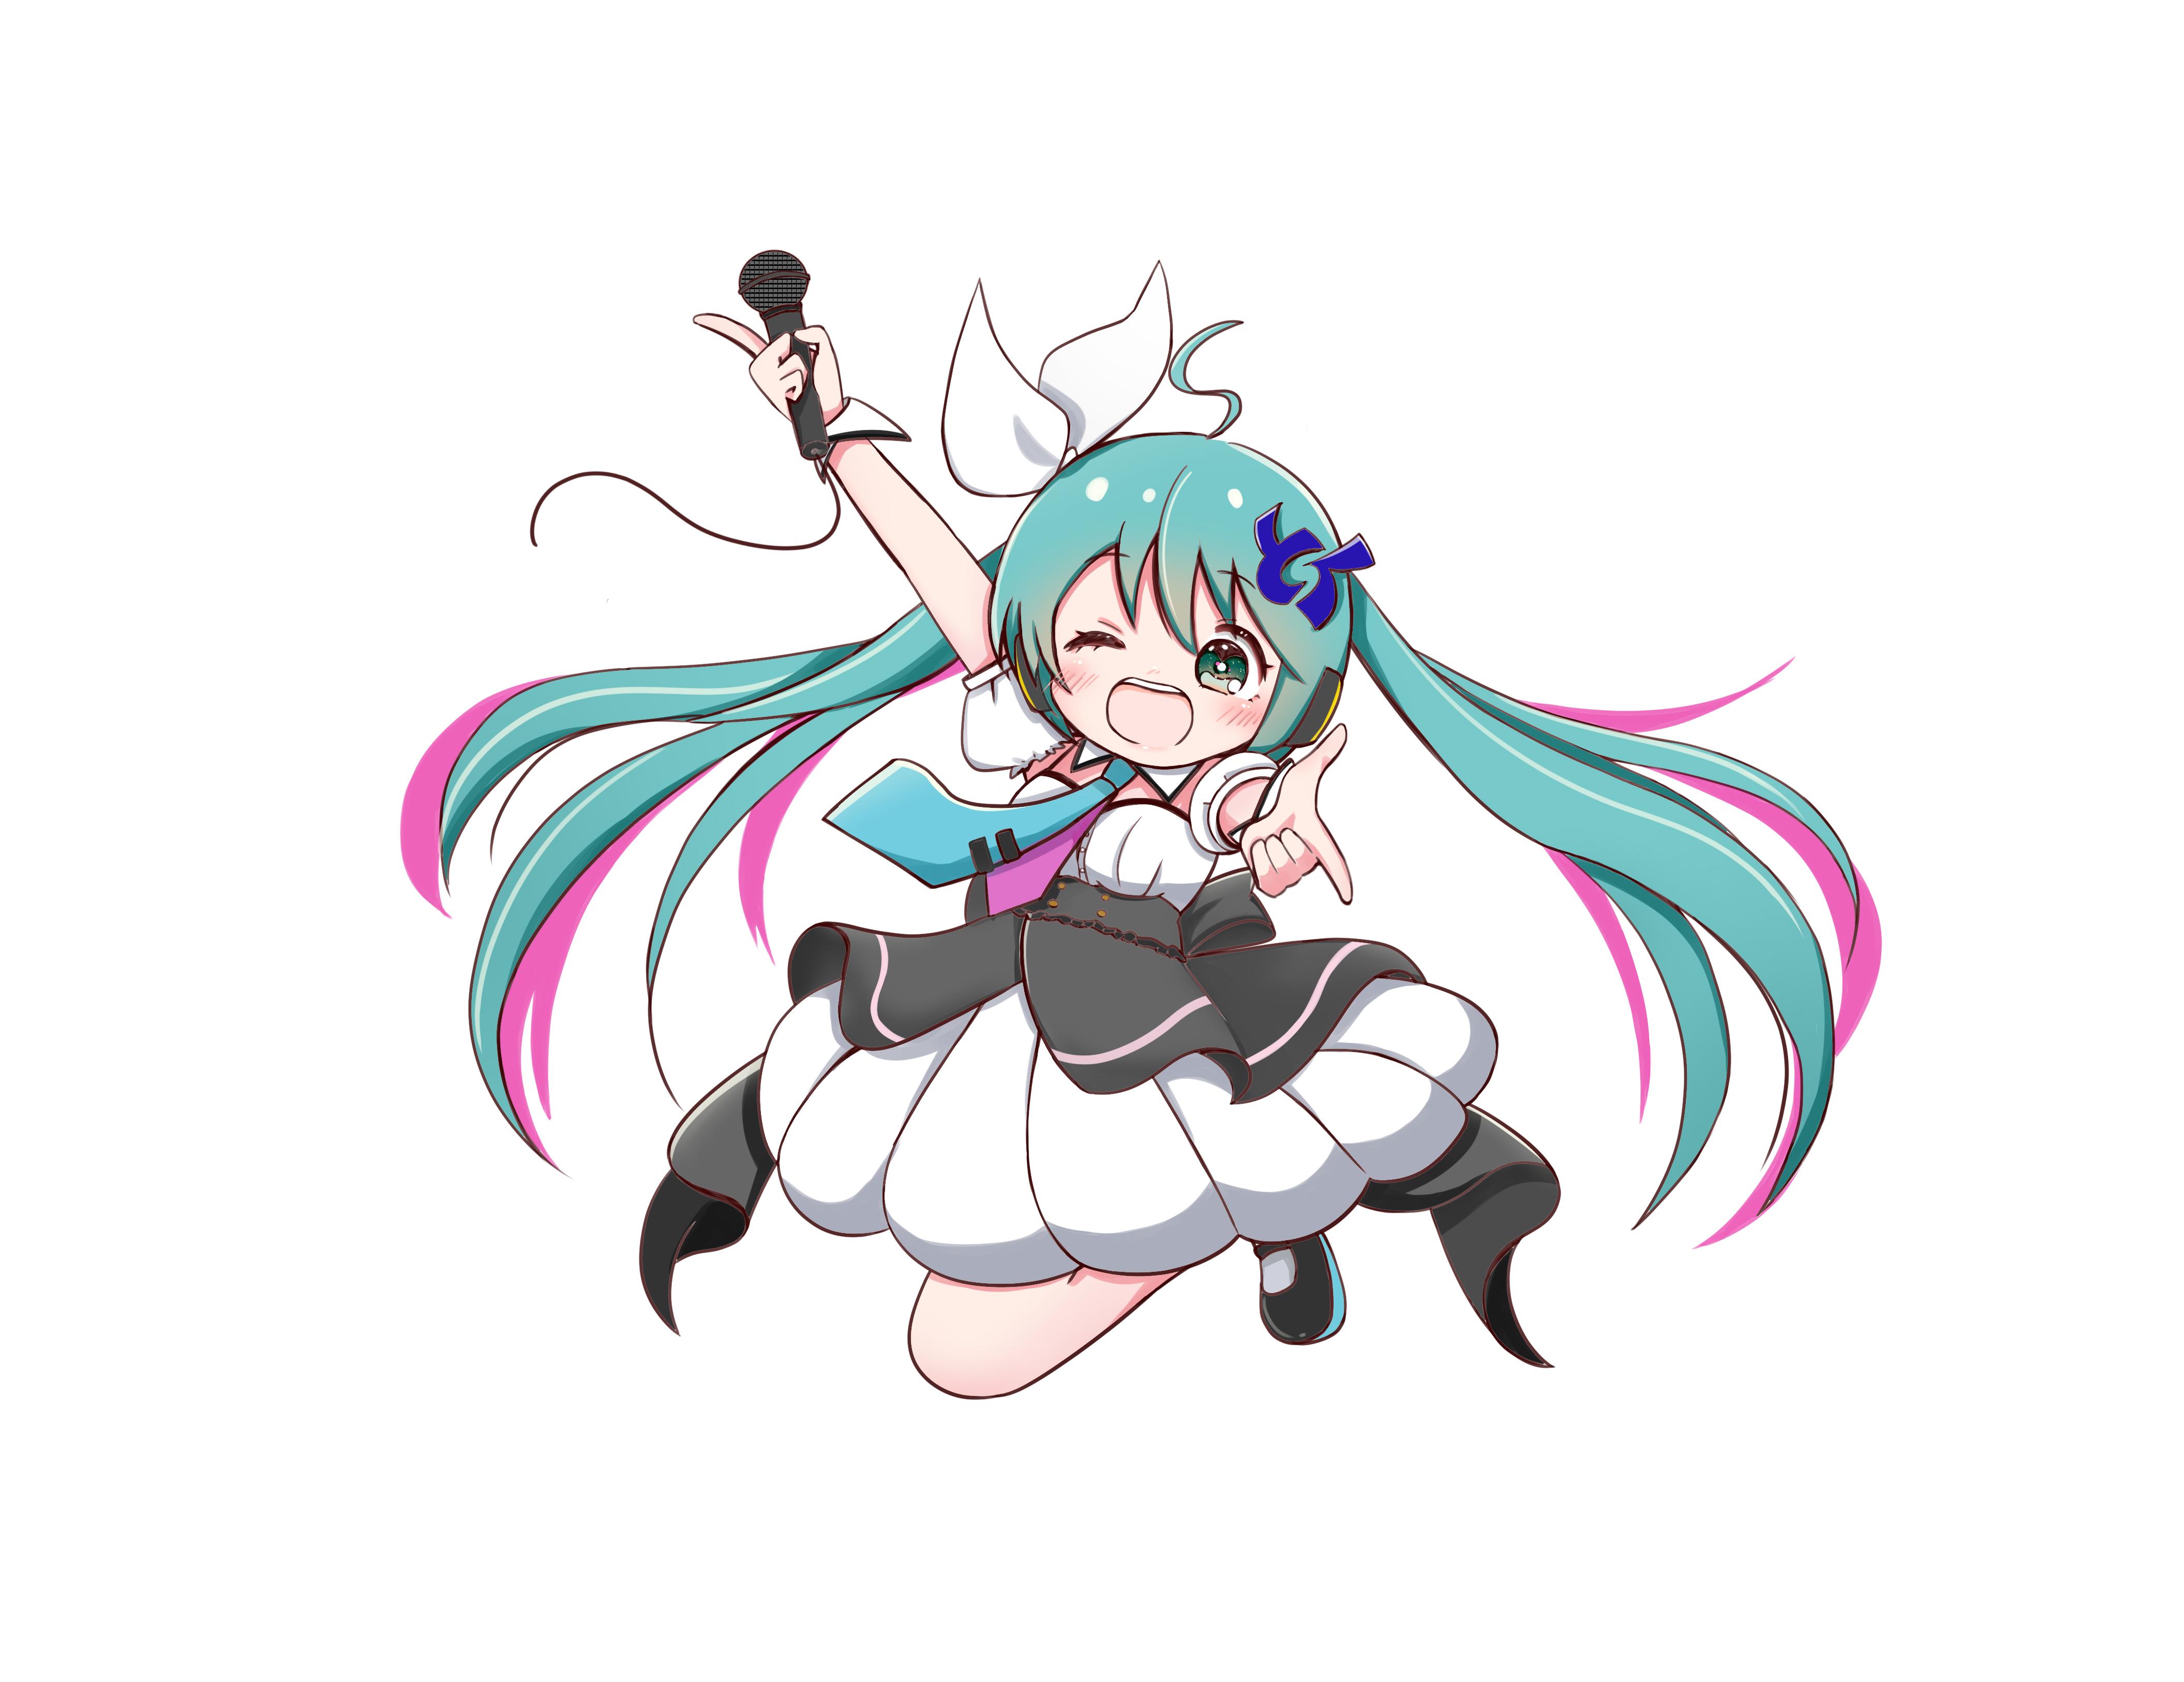 miku273.jpg (1.8 MB)